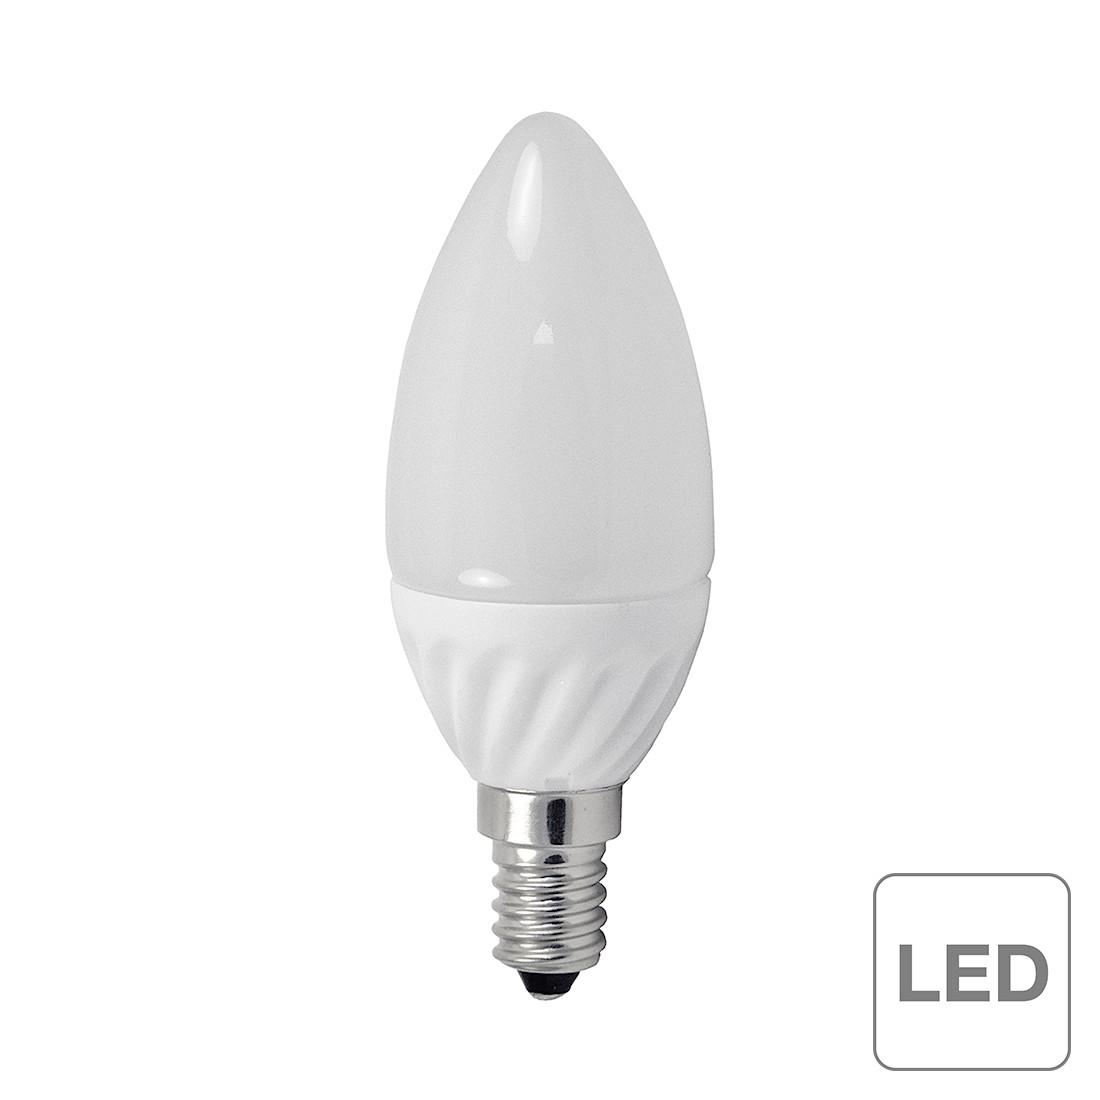 Leuchtmittel LED-Kerze, E14, 4W (3er Set) – 1-flammig, BTR günstig online kaufen